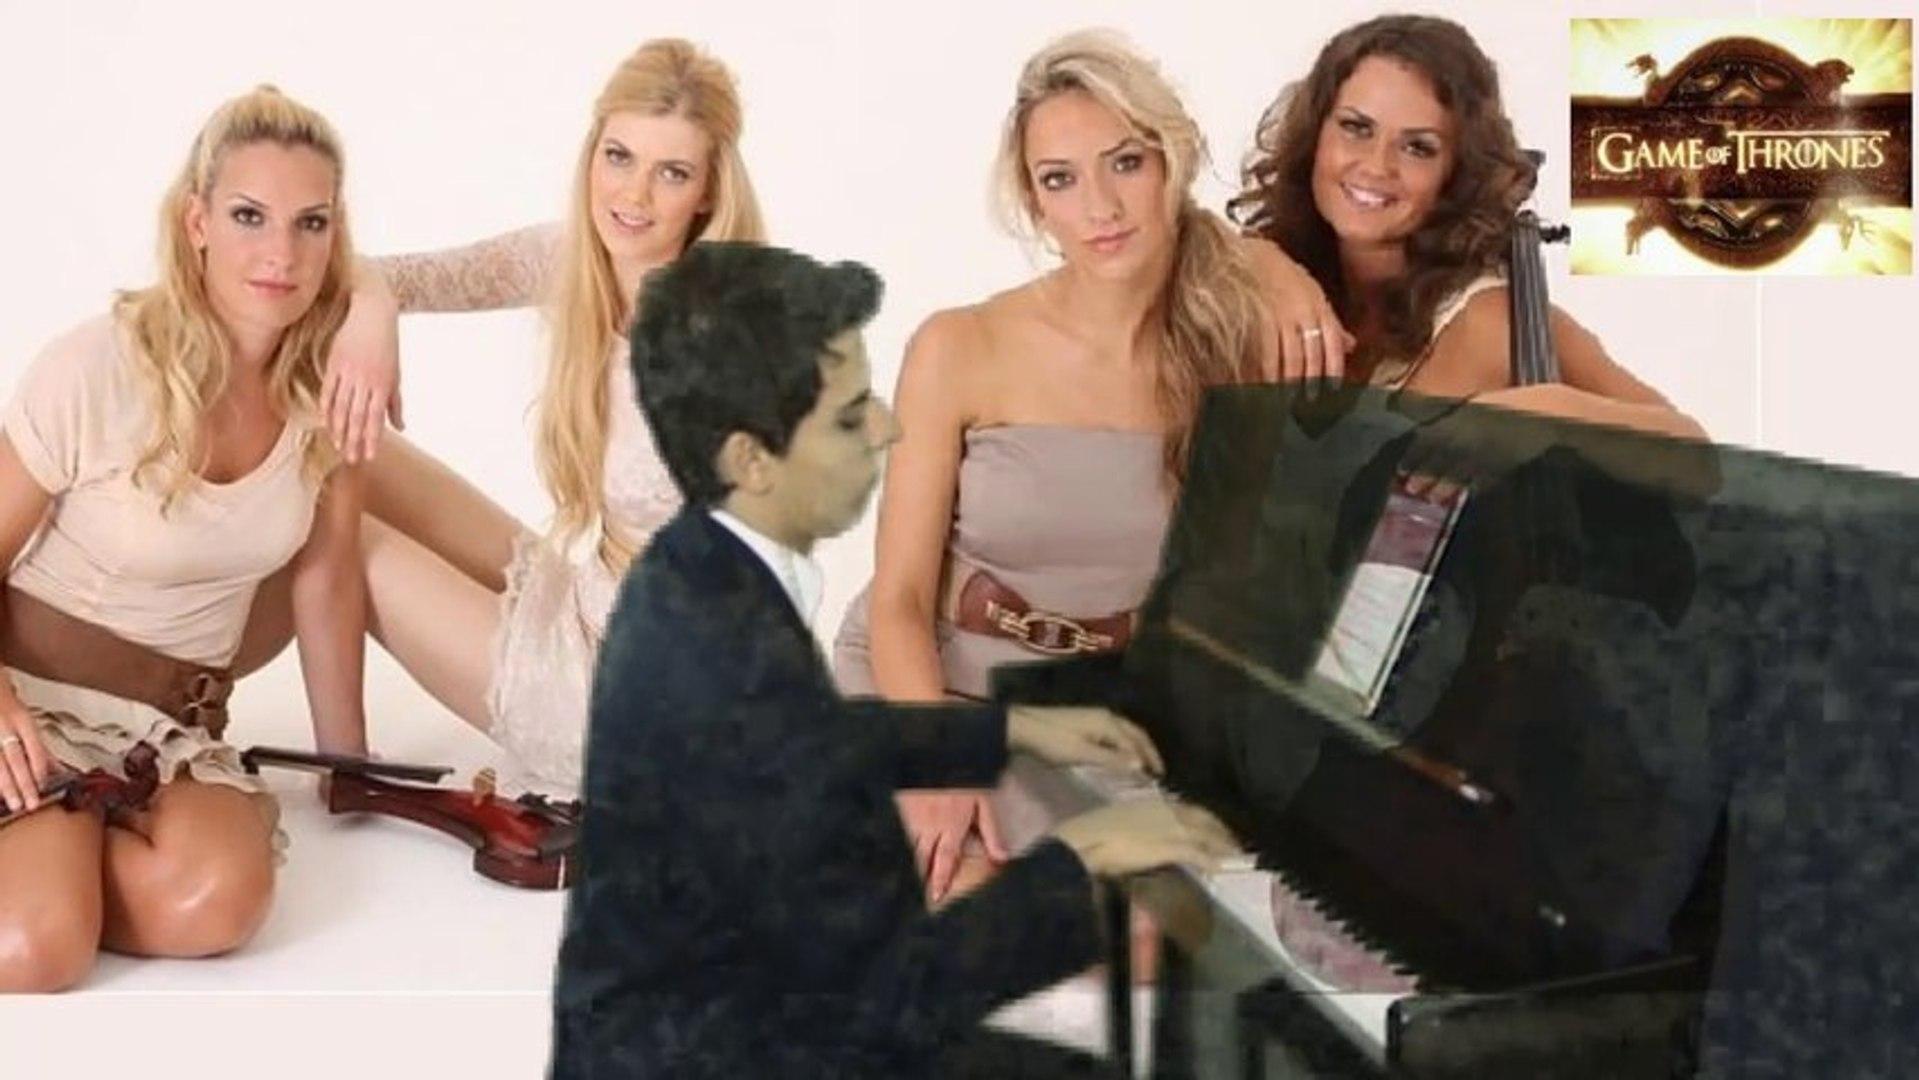 Game of Thrones Taht Oyunu Orjinal Film Müziği Piyano Orkestra YouTube Senfoni Dizi Keman Çello Yayl